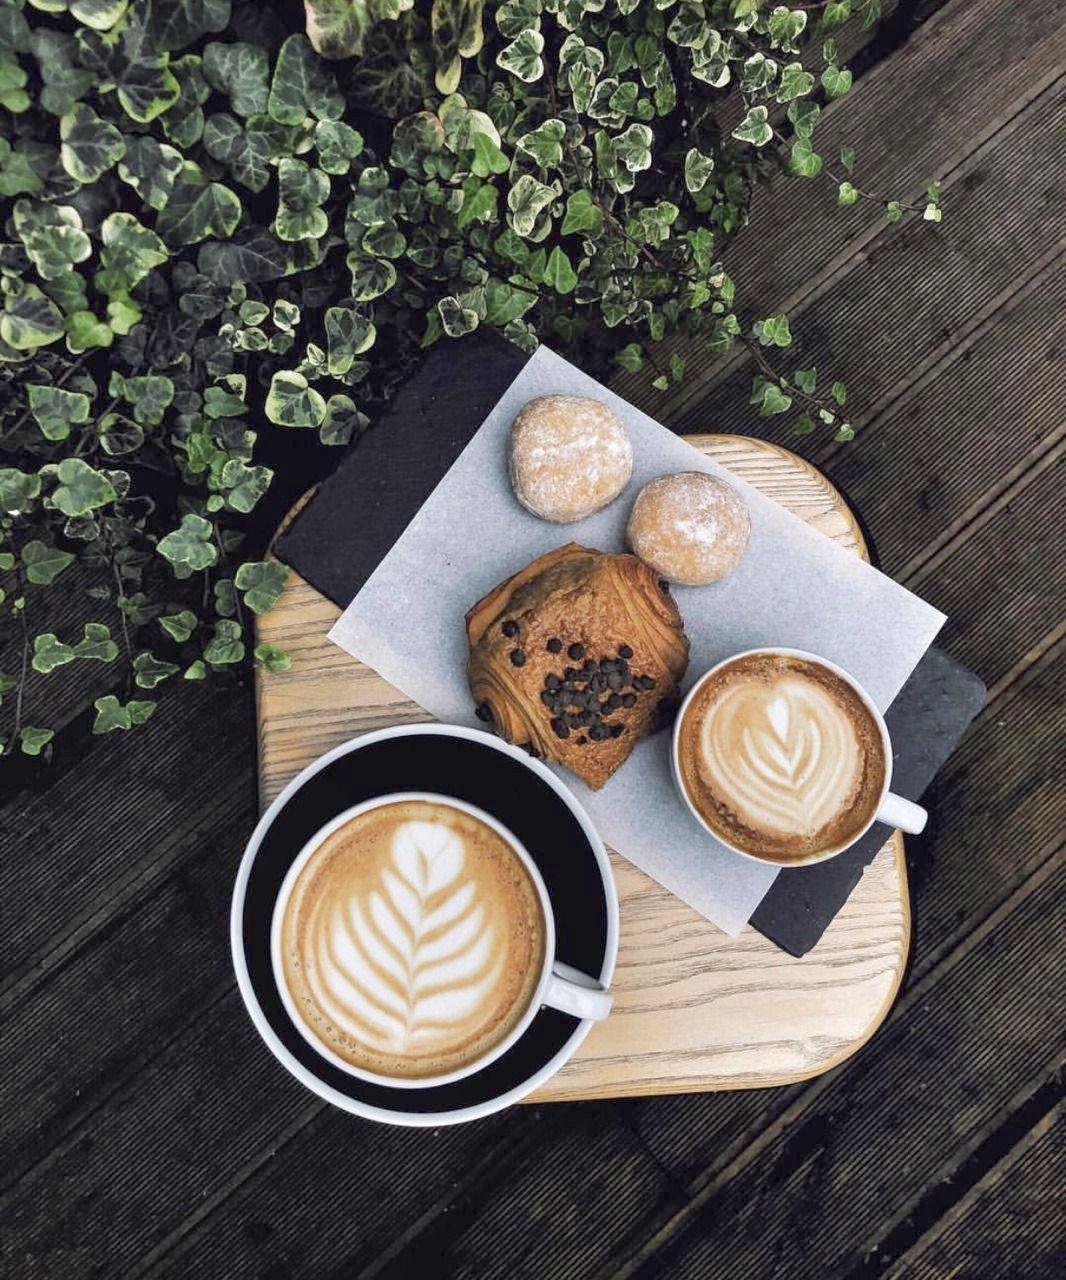 Coffee Bean And Tea Leaf Malibu Though Coffee Beans Menu Rhinelander Coffee Bean Menu Thailand Wherever Coffee Ne Coffee Cafe Coffee Tasting Aesthetic Coffee